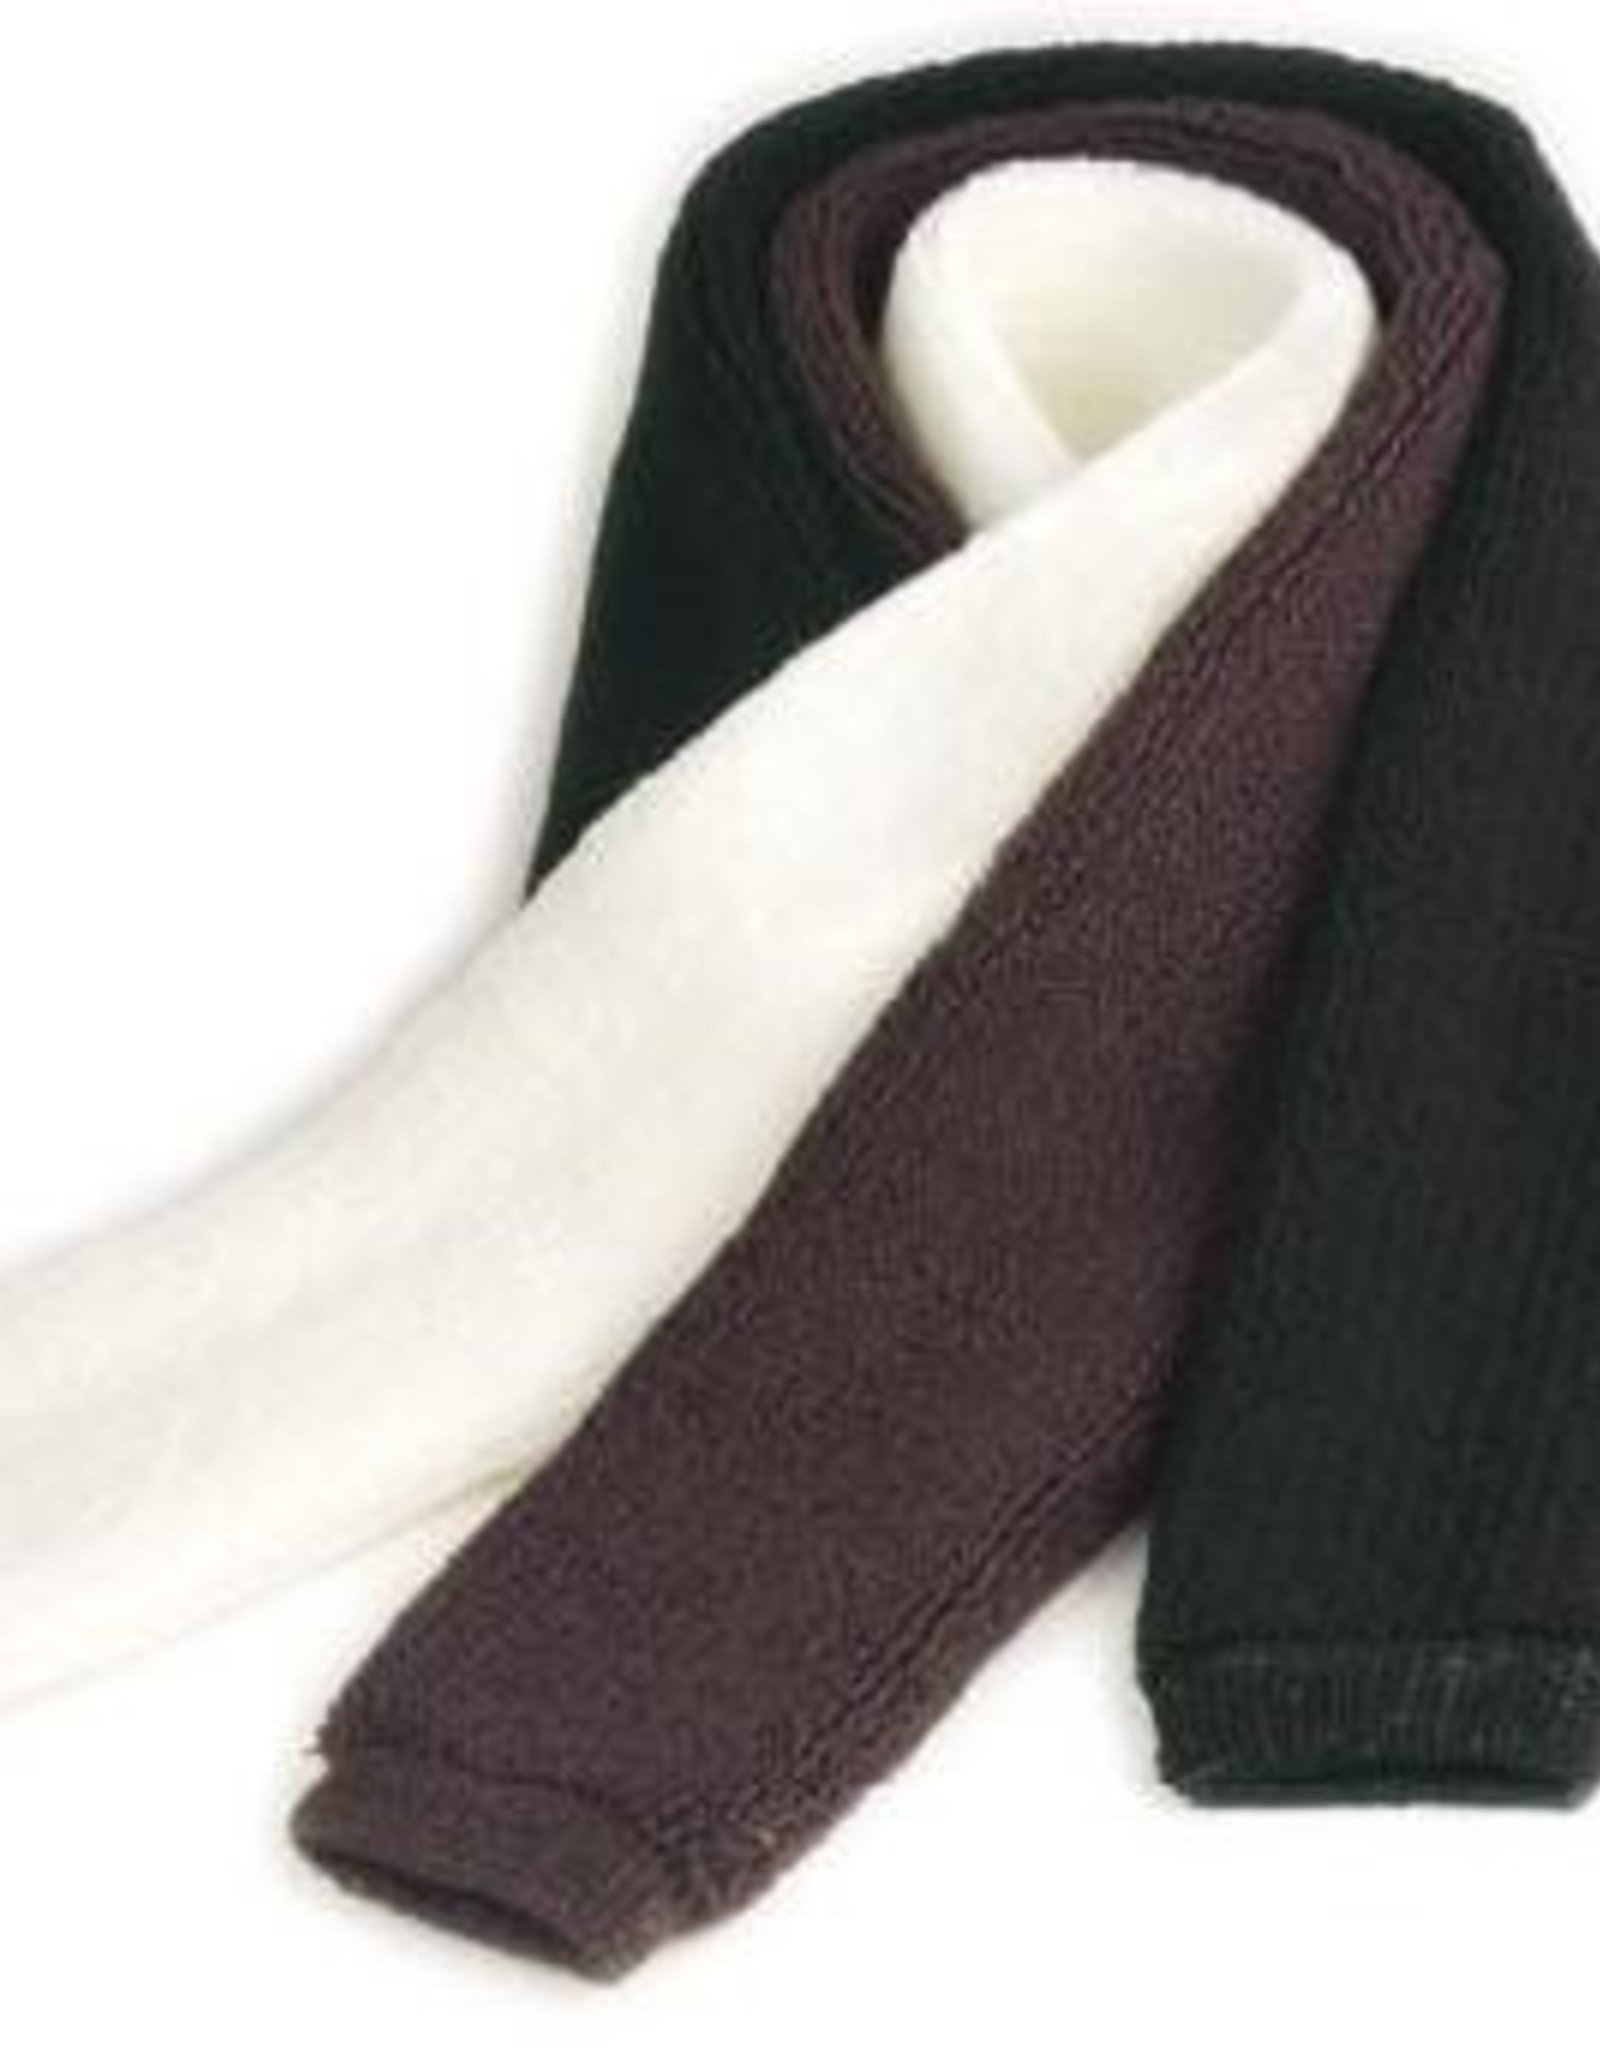 Ovation Incredible Girth Sock - Short